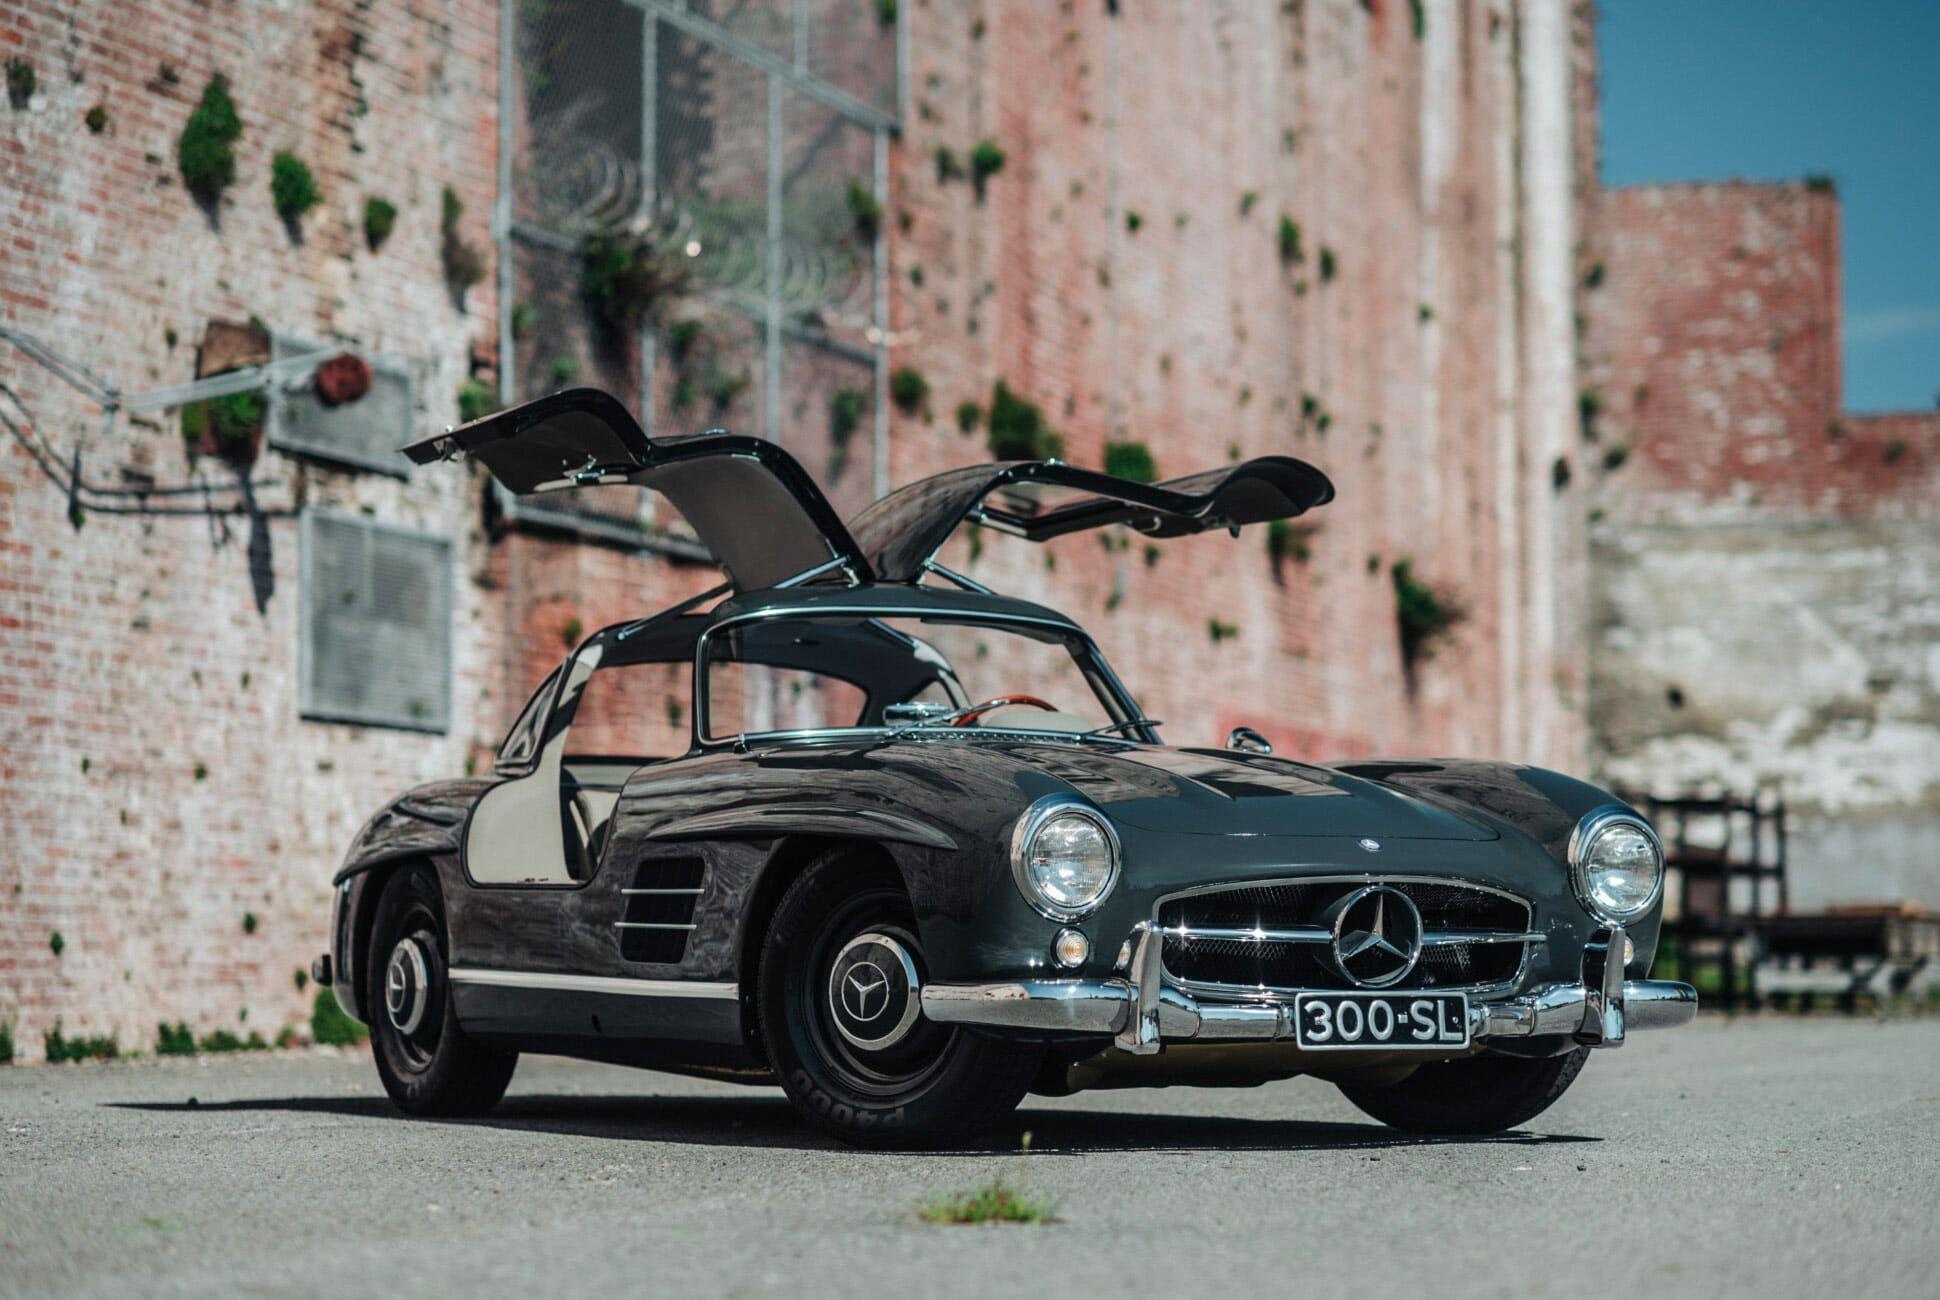 1956-Mercedes-Benz-300SL-Gullwing-gear-patrol-slide-6